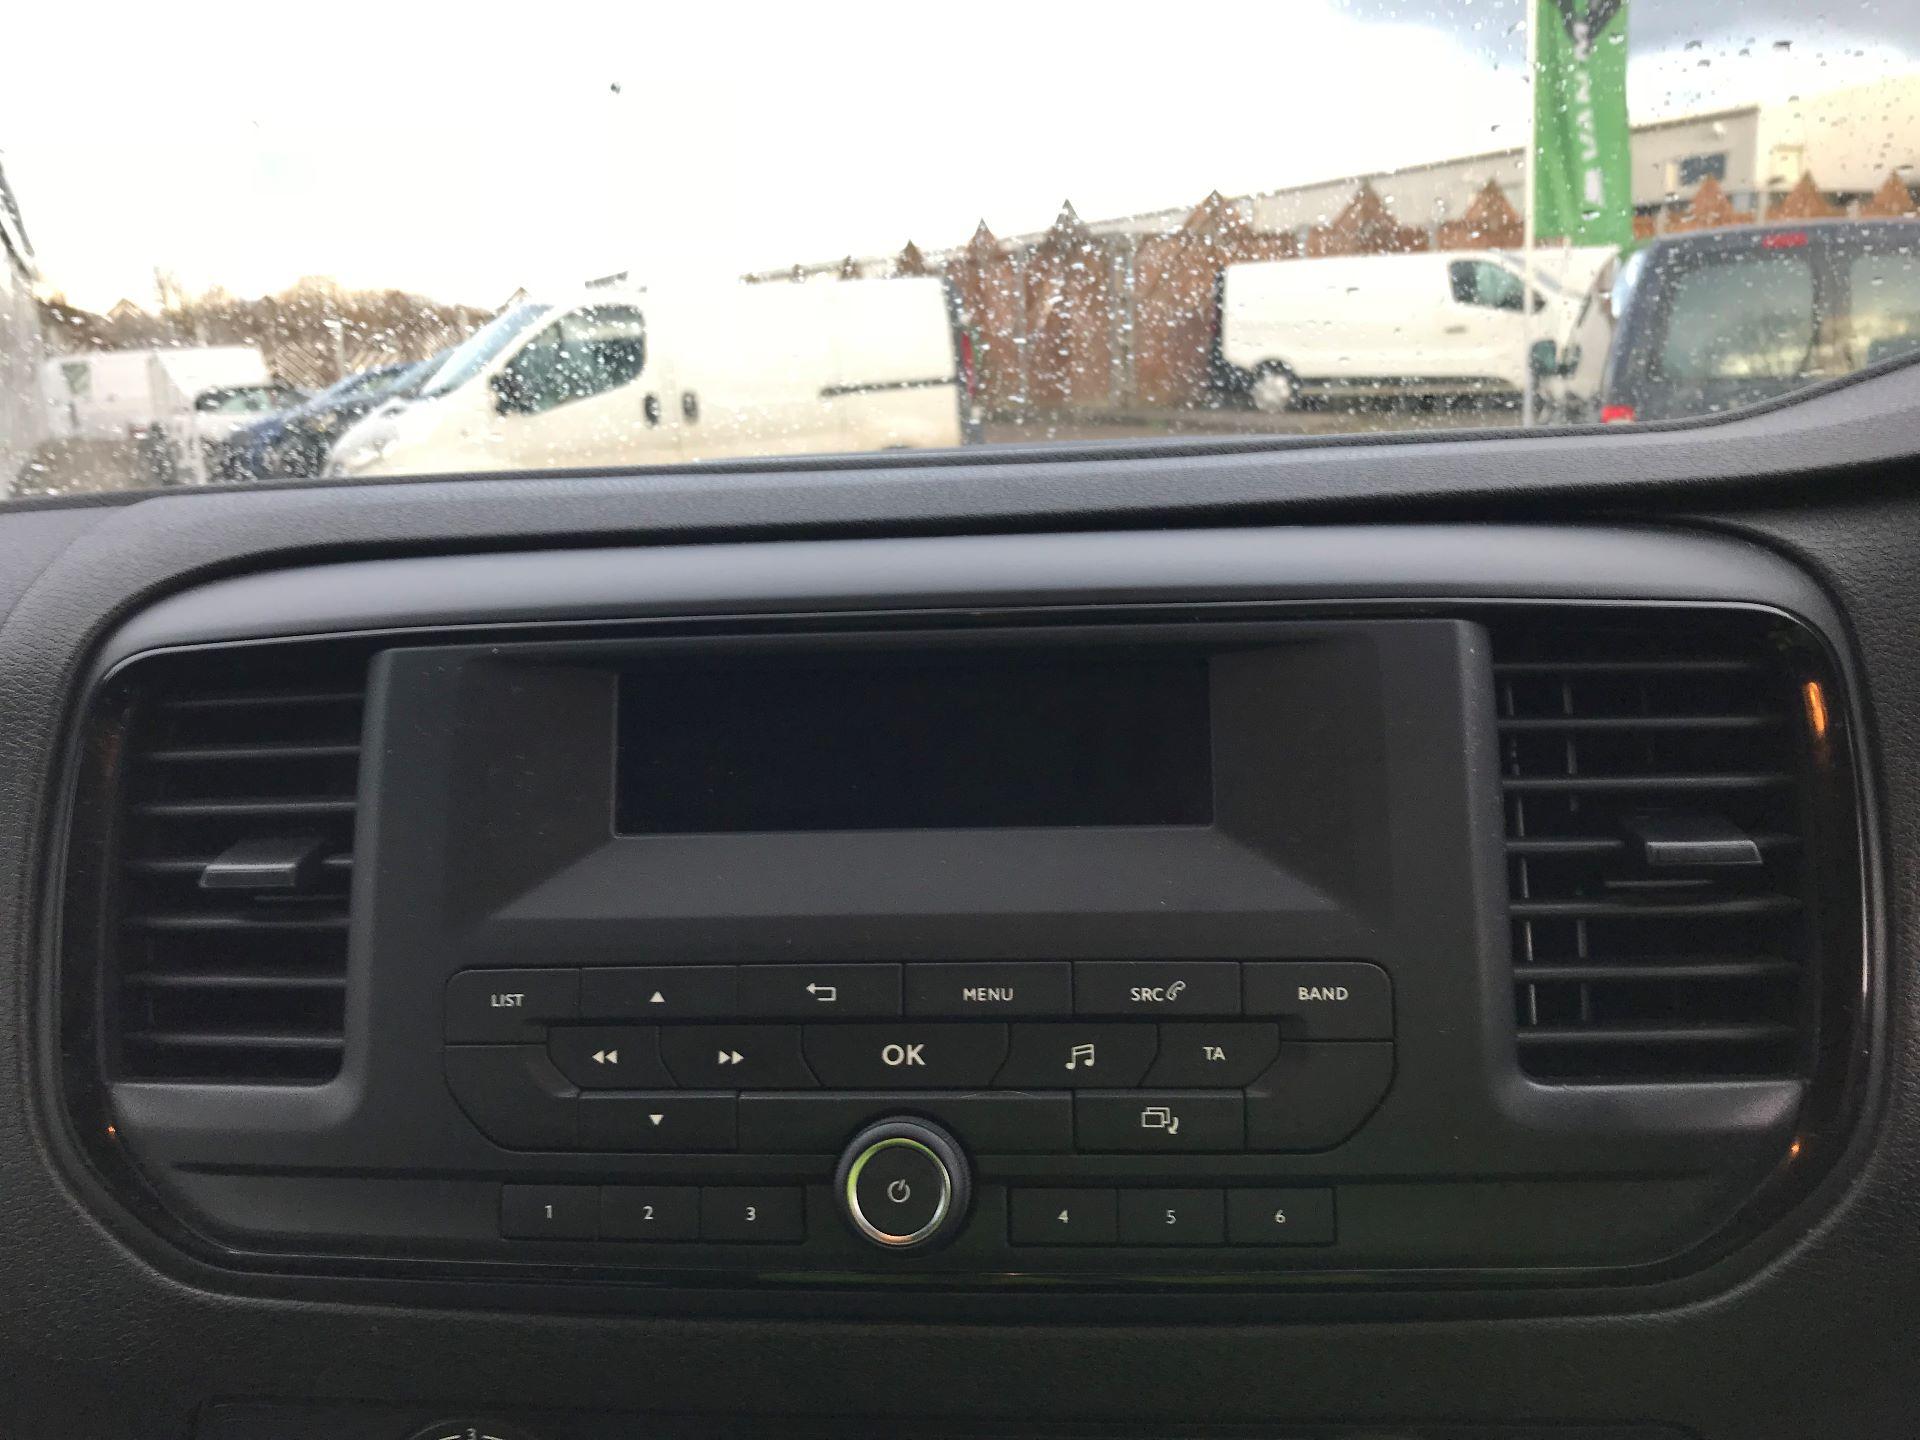 2018 Peugeot Expert  STANDARD 1000 1.6 BLUEHDI 95 S EURO 6 (NU18VTP) Image 19